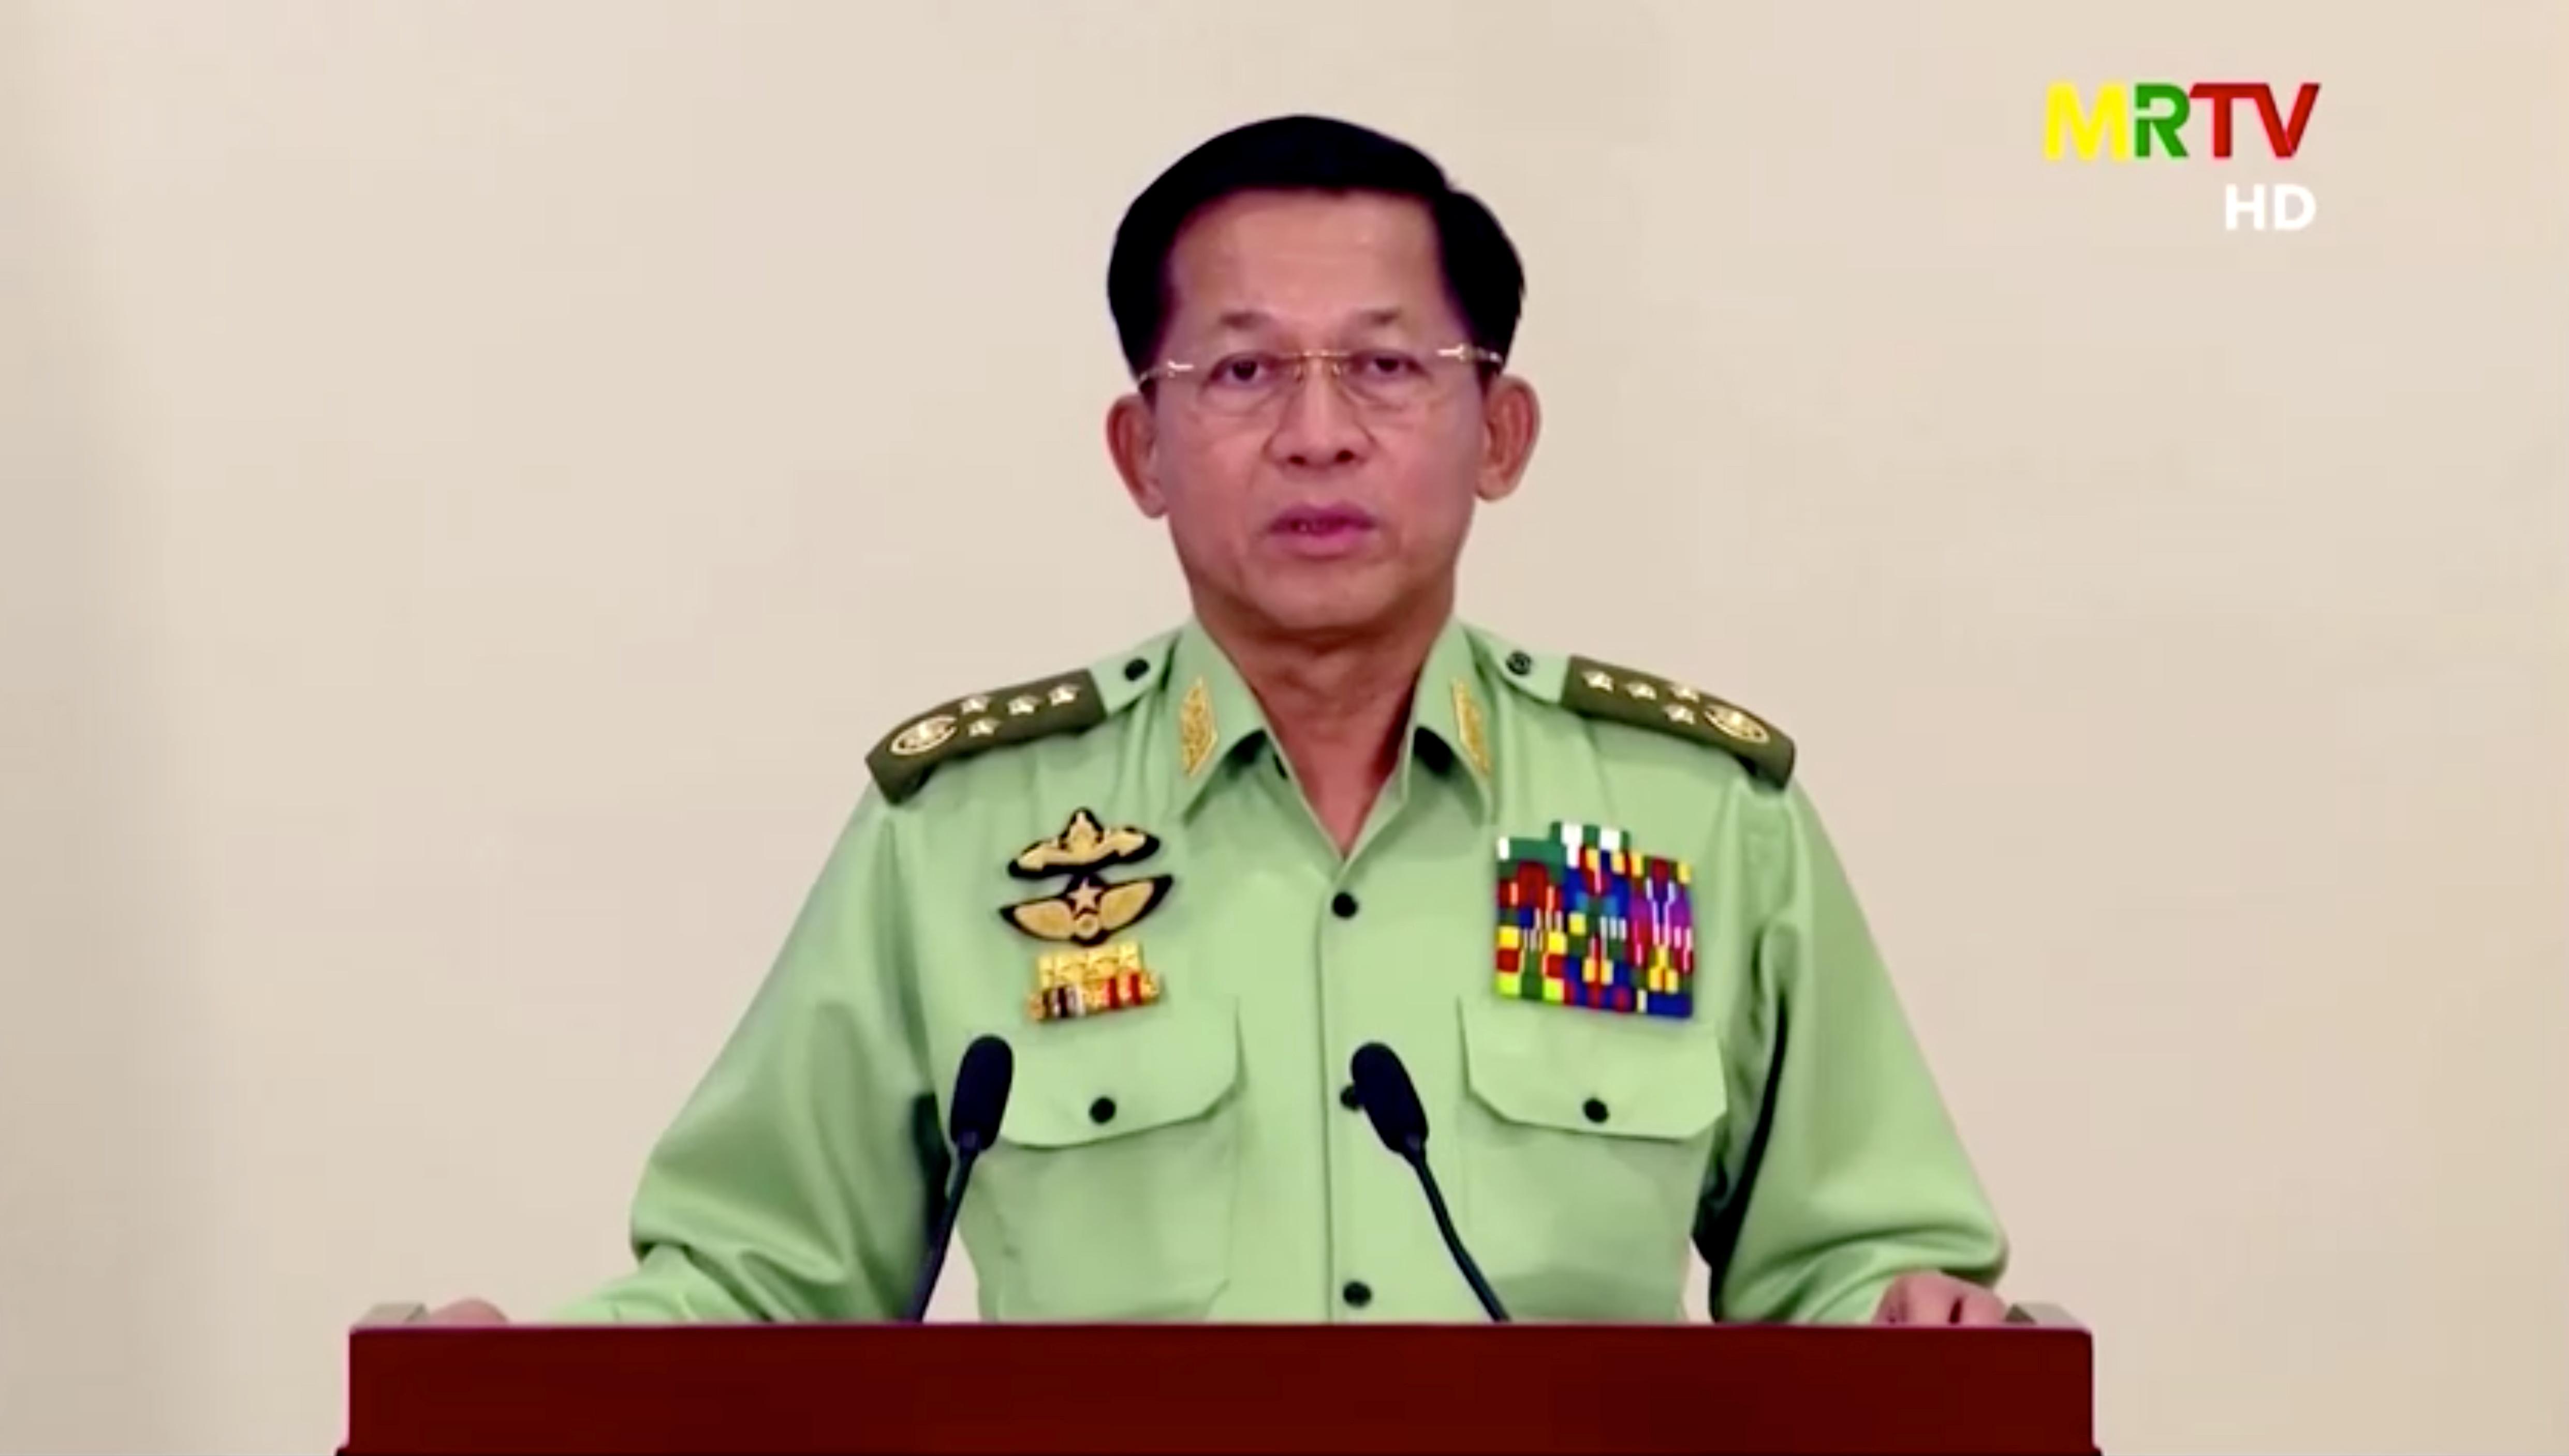 Myanmar's military junta leader, General Min Aung Hlaing, speaks in a media broadcast in Naypyitaw, Myanmar February 8, 2021 in this still image taken from video. MRTV/Reuters TV via REUTERS